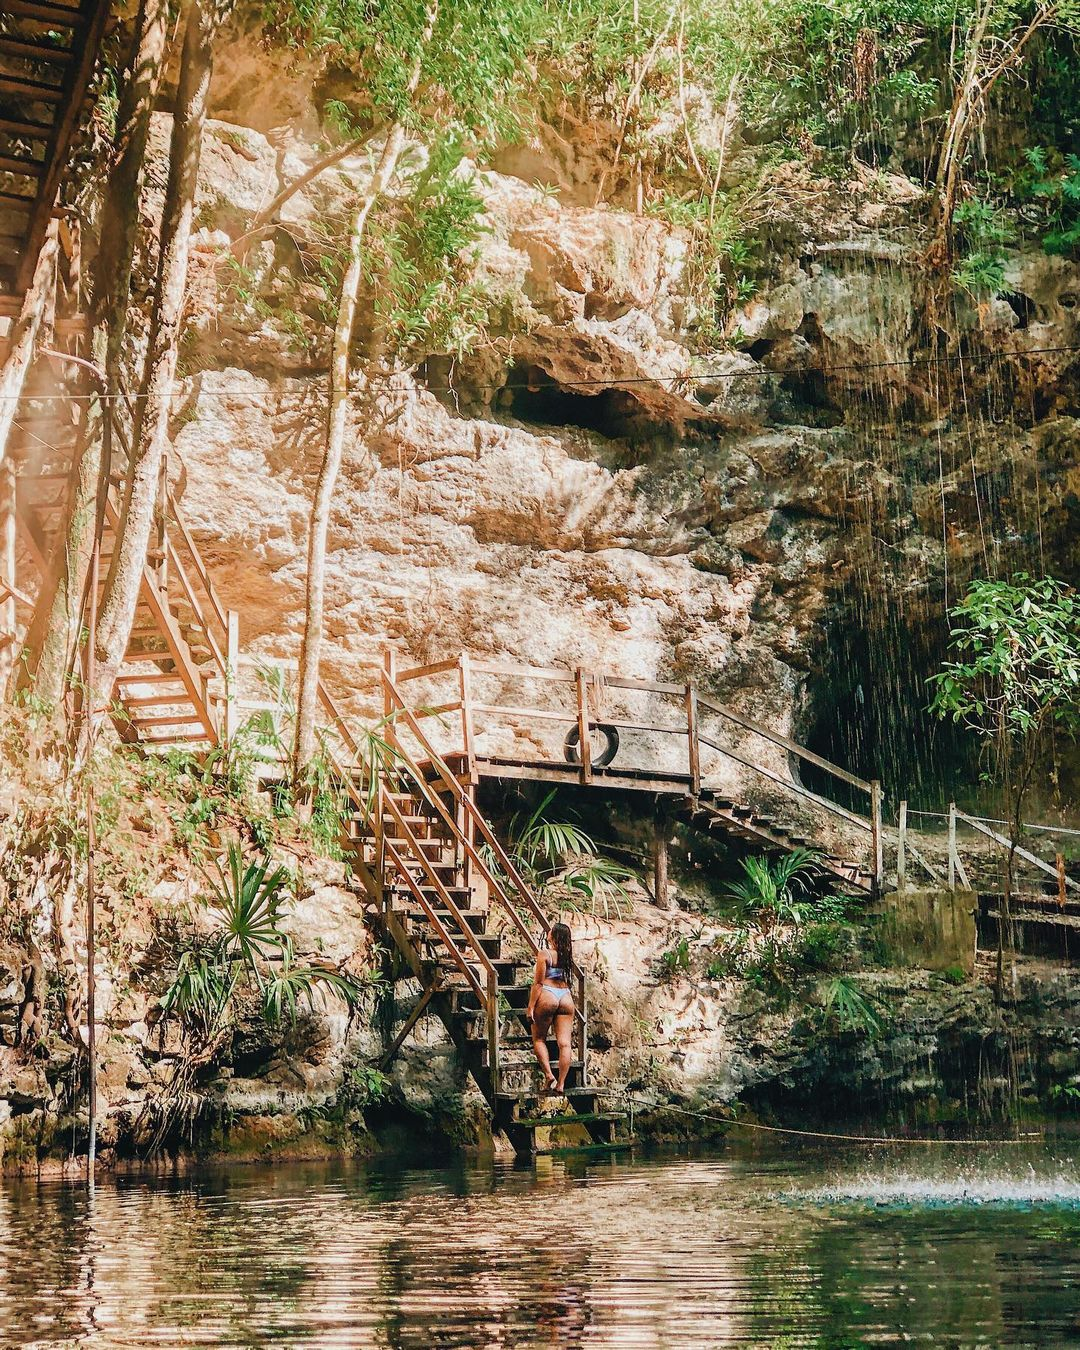 cenote-xcanche-tirolesa